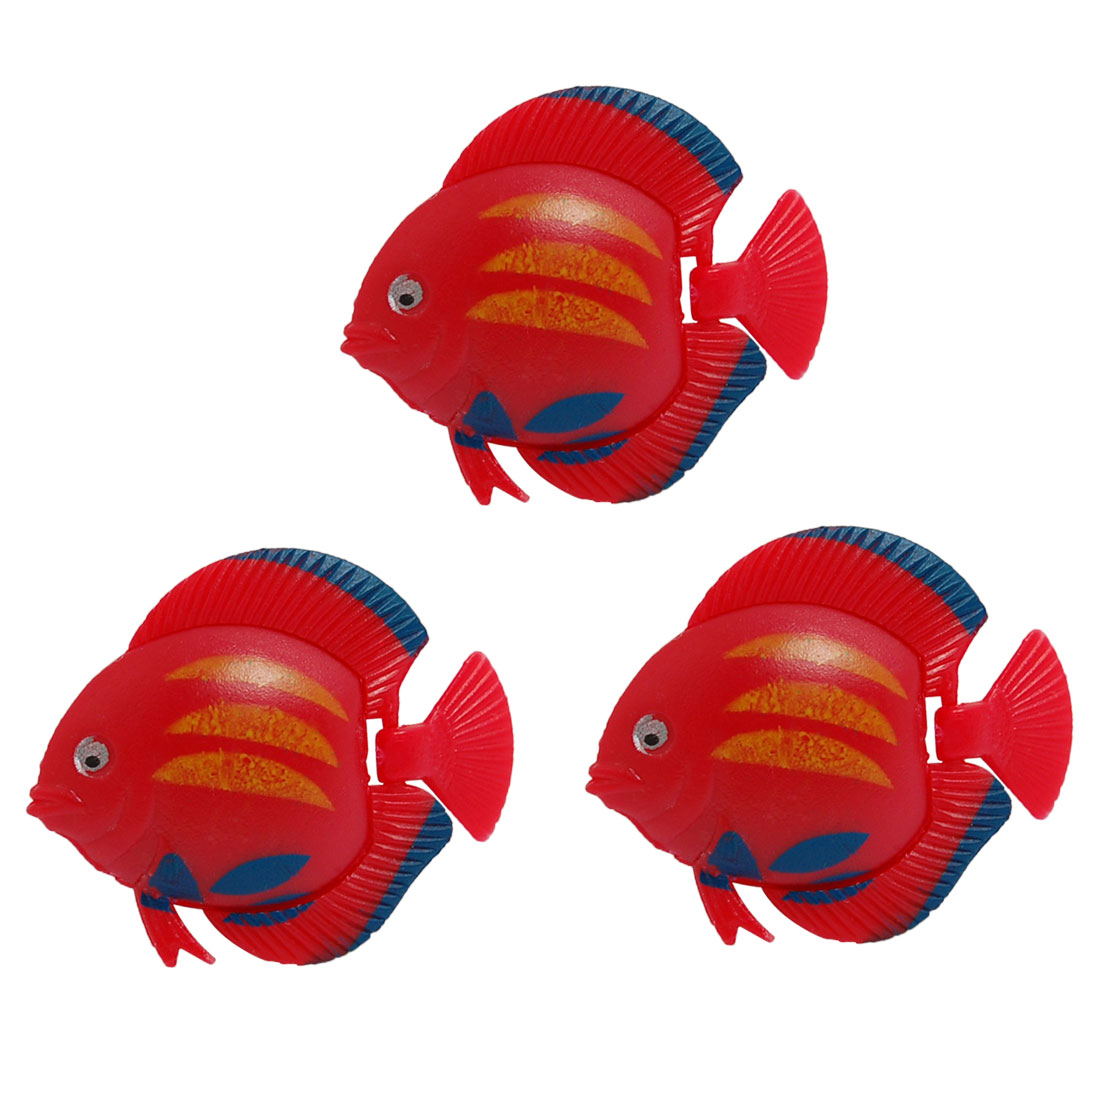 3 Pcs Red Plastic Floating Tropical Fish for Aquarium Tank